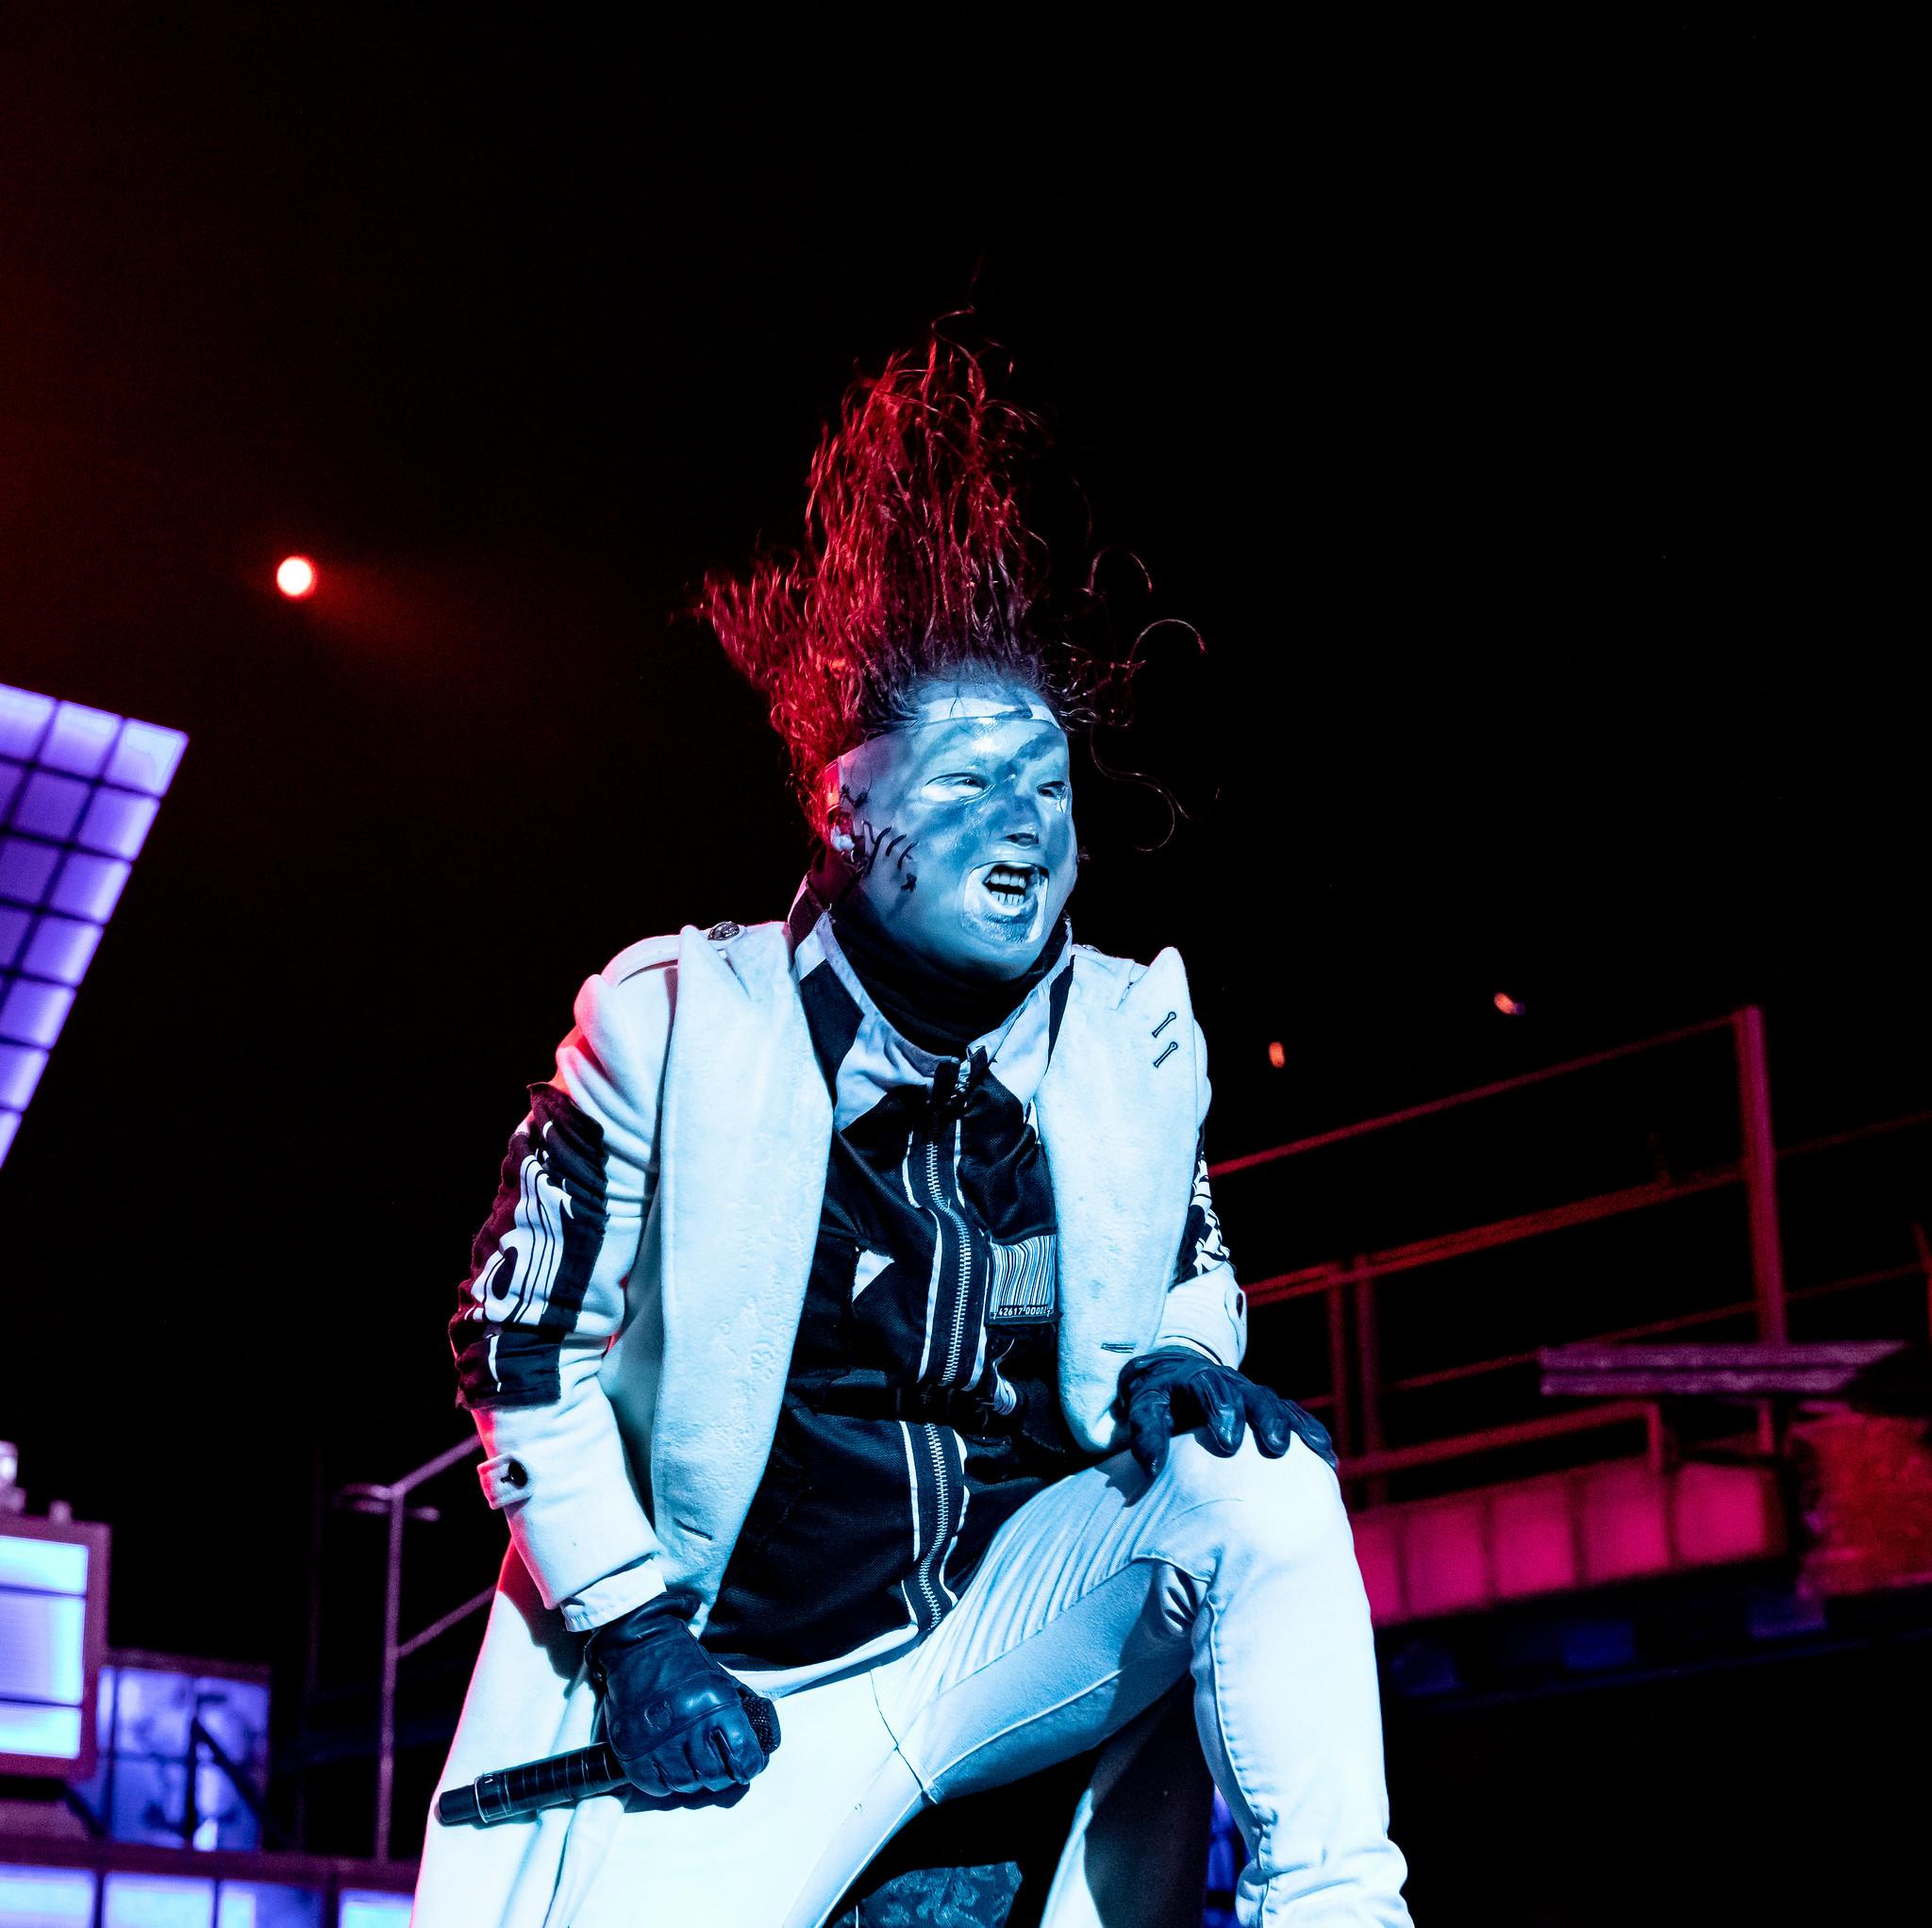 Slipknot Knotfest 22